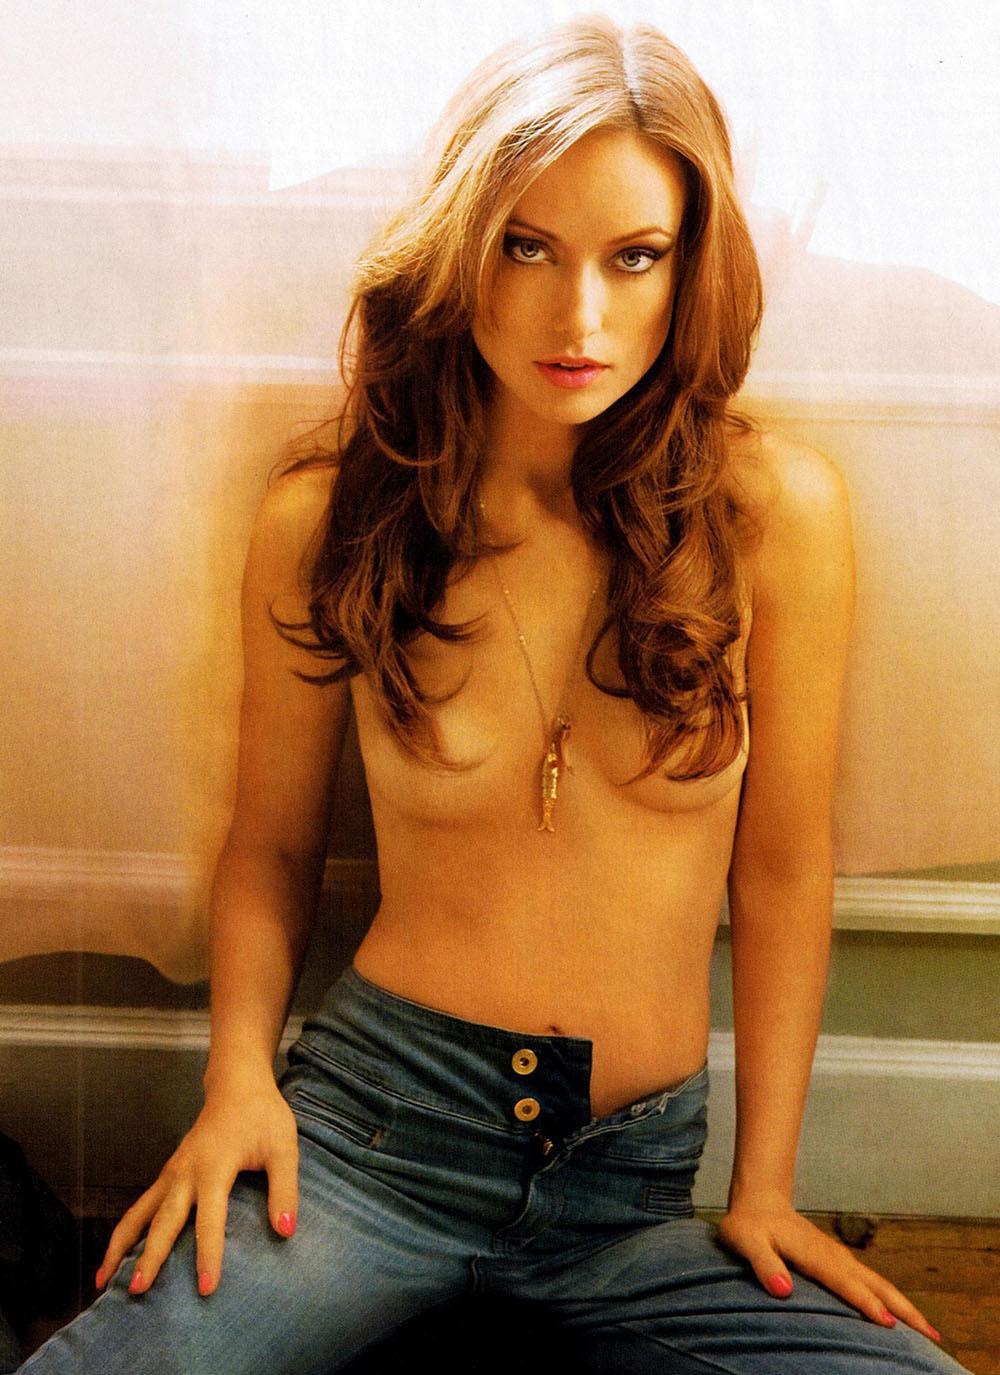 Olivia wilde nude gallery